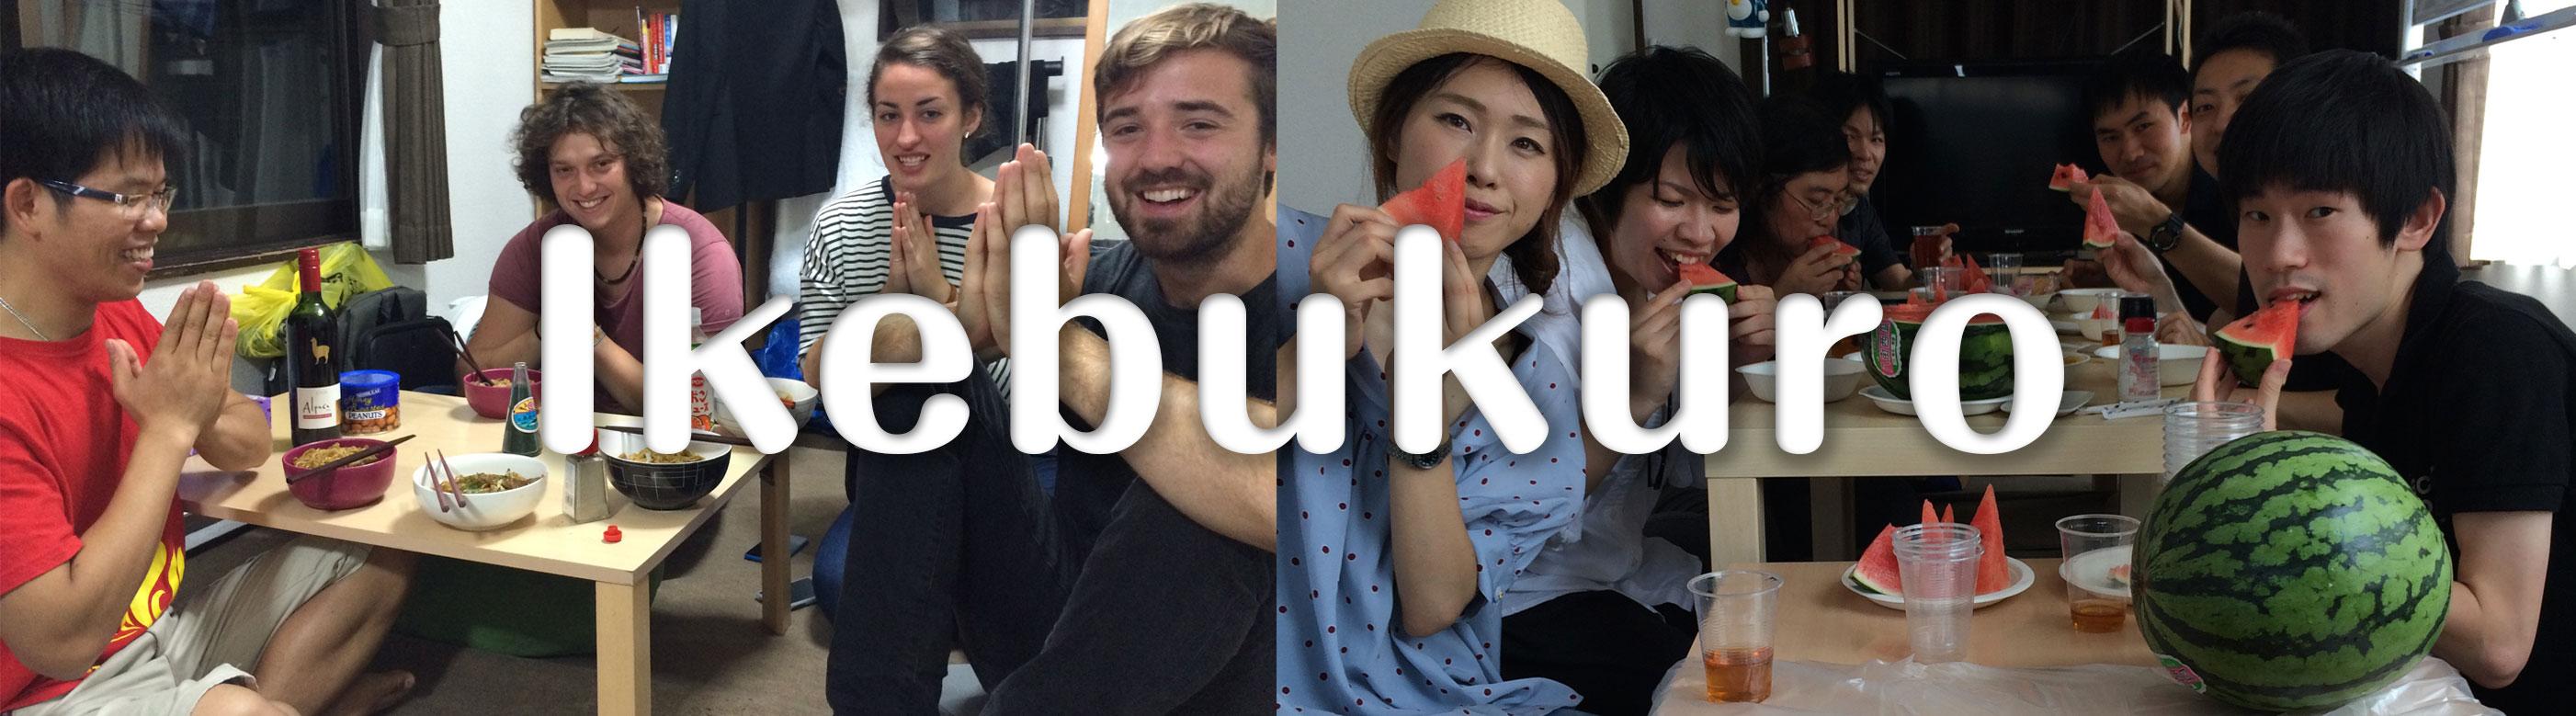 ikebukuro_en